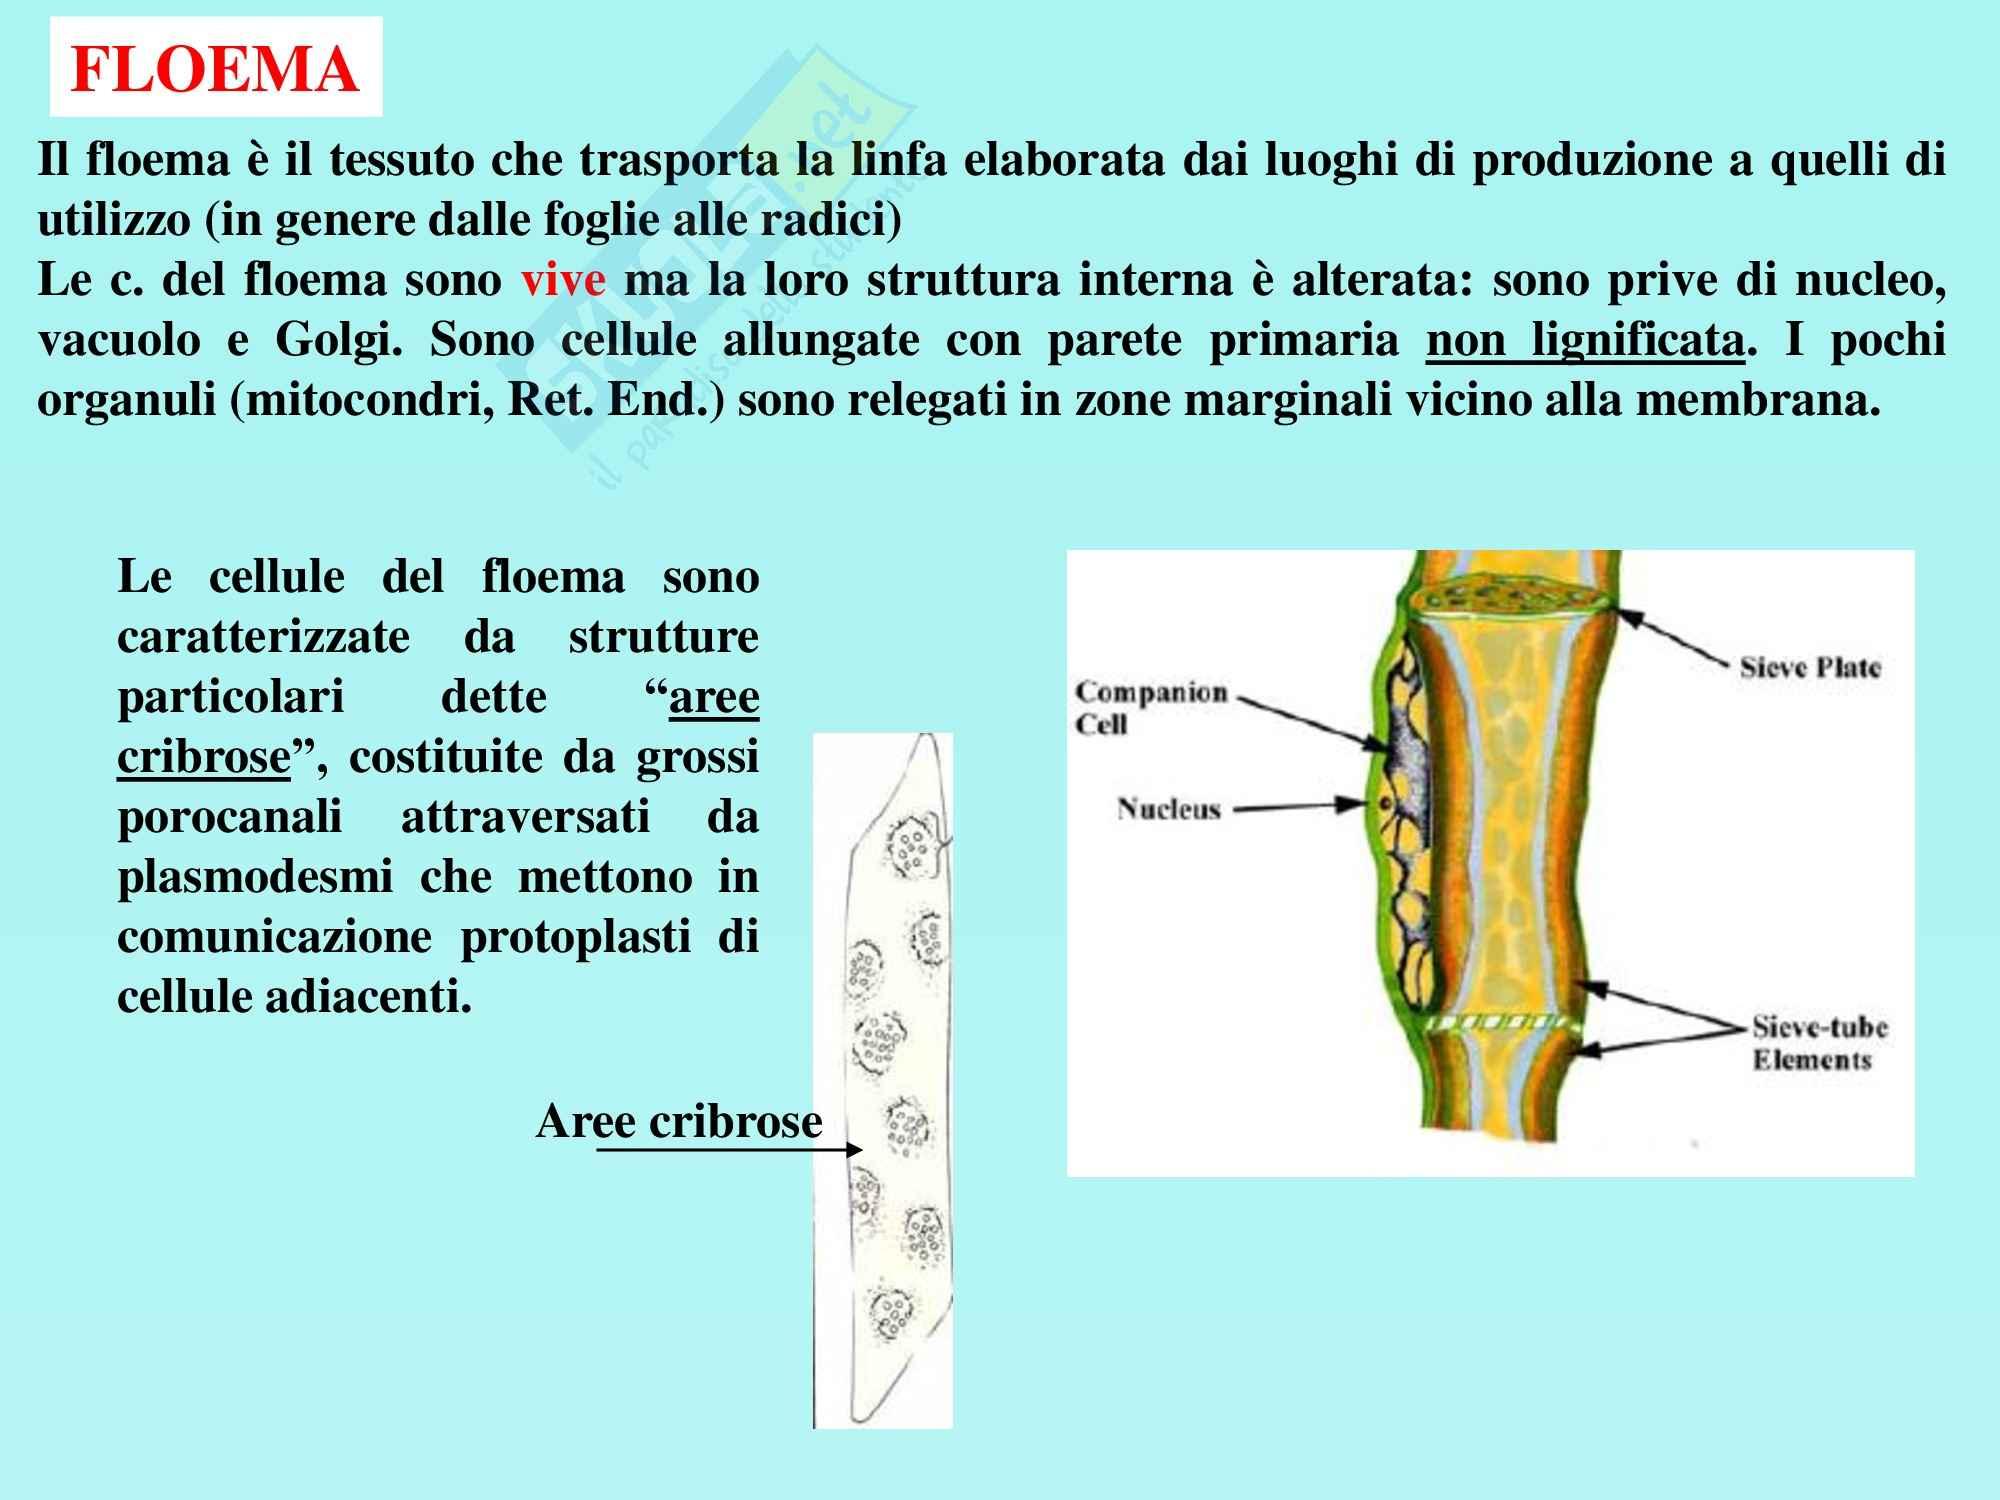 Biologia vegetale - tessuti fondamentali e vascolari Pag. 36